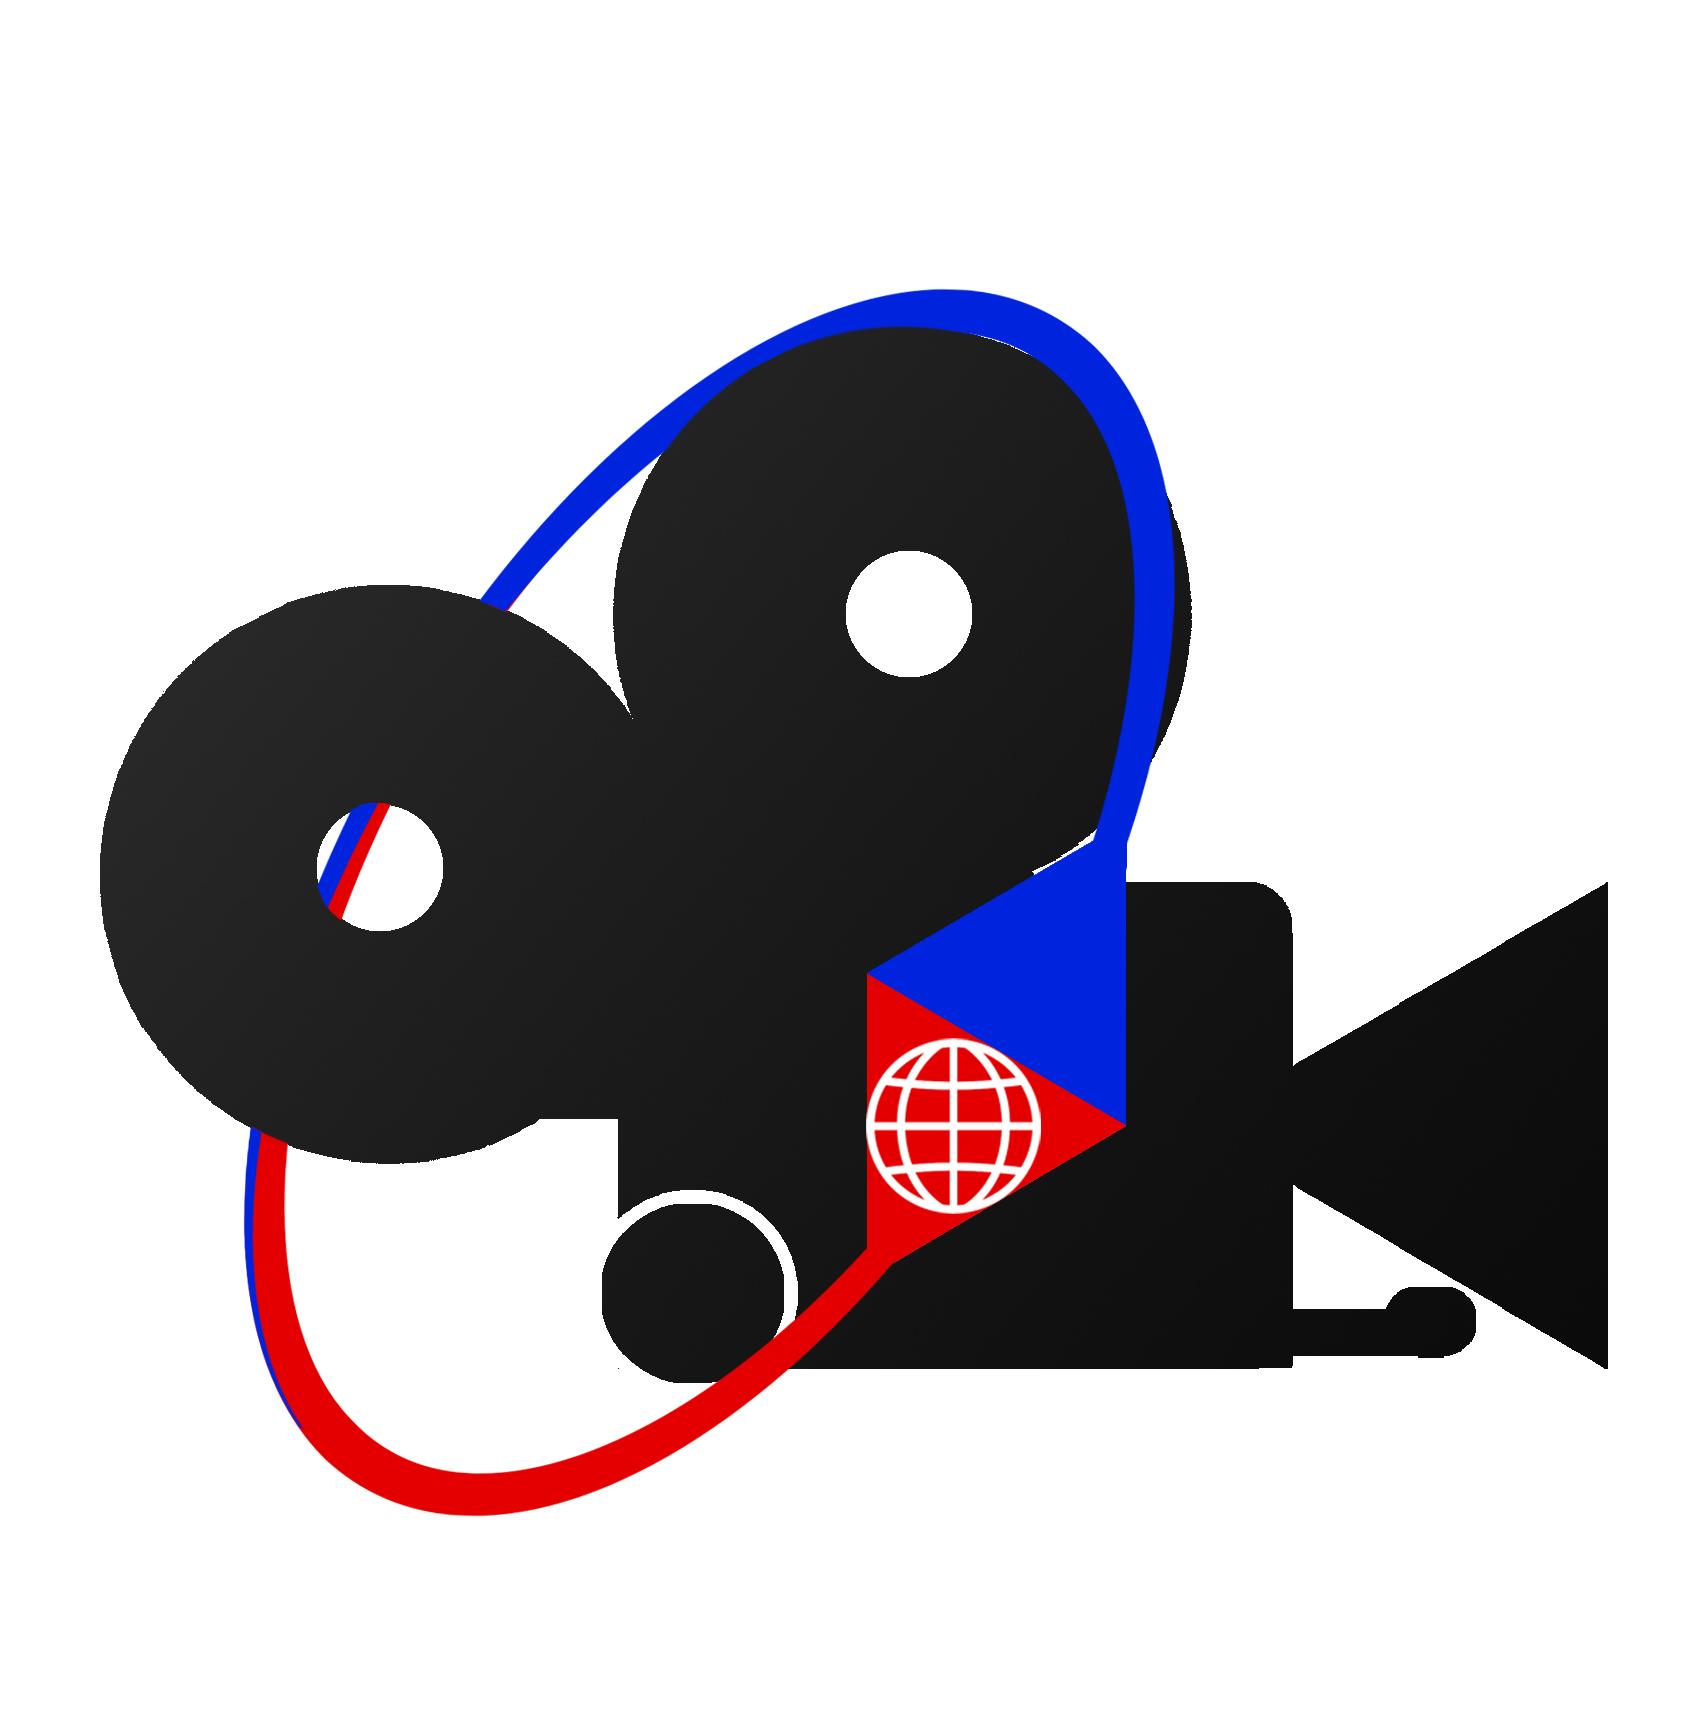 Разработка логотипа и иконки для Travel Video Platform фото f_0625c38ff1dcee9a.jpg